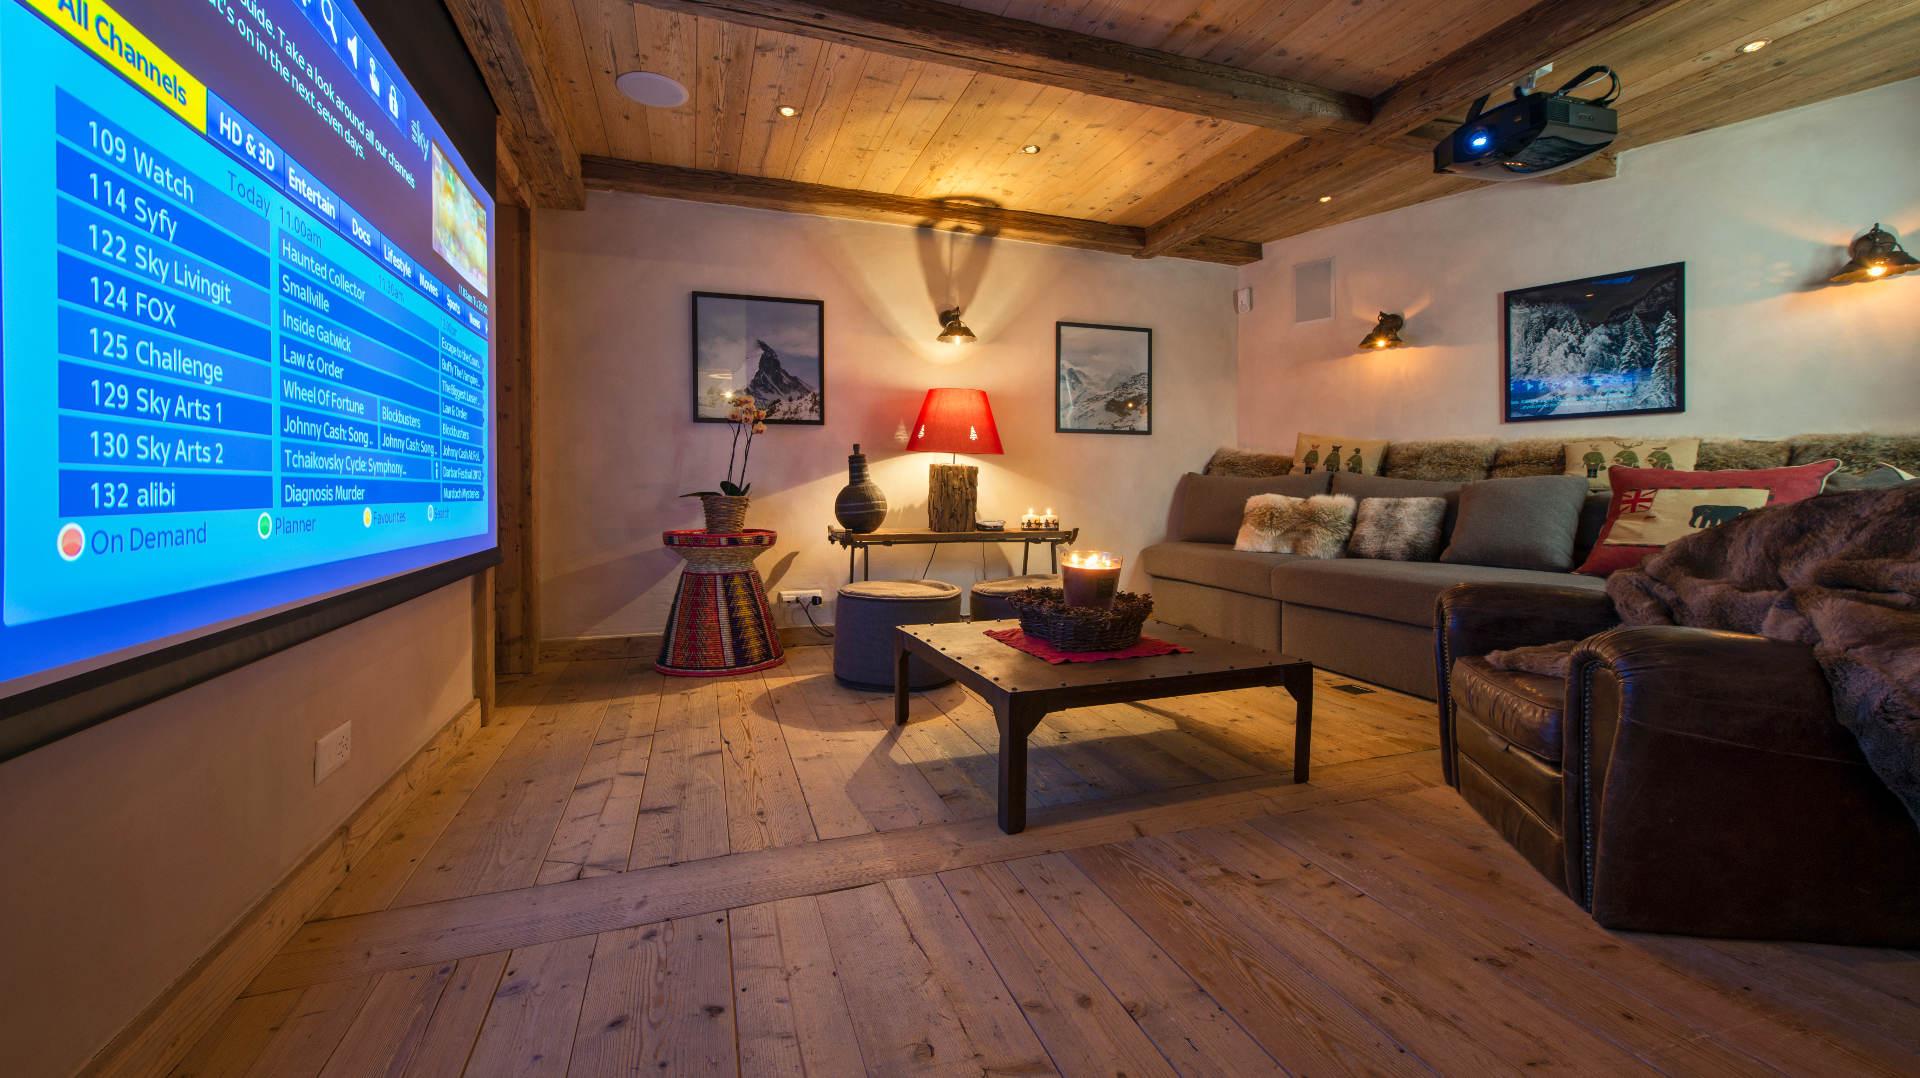 chalet-nyumba-cinema-room-2